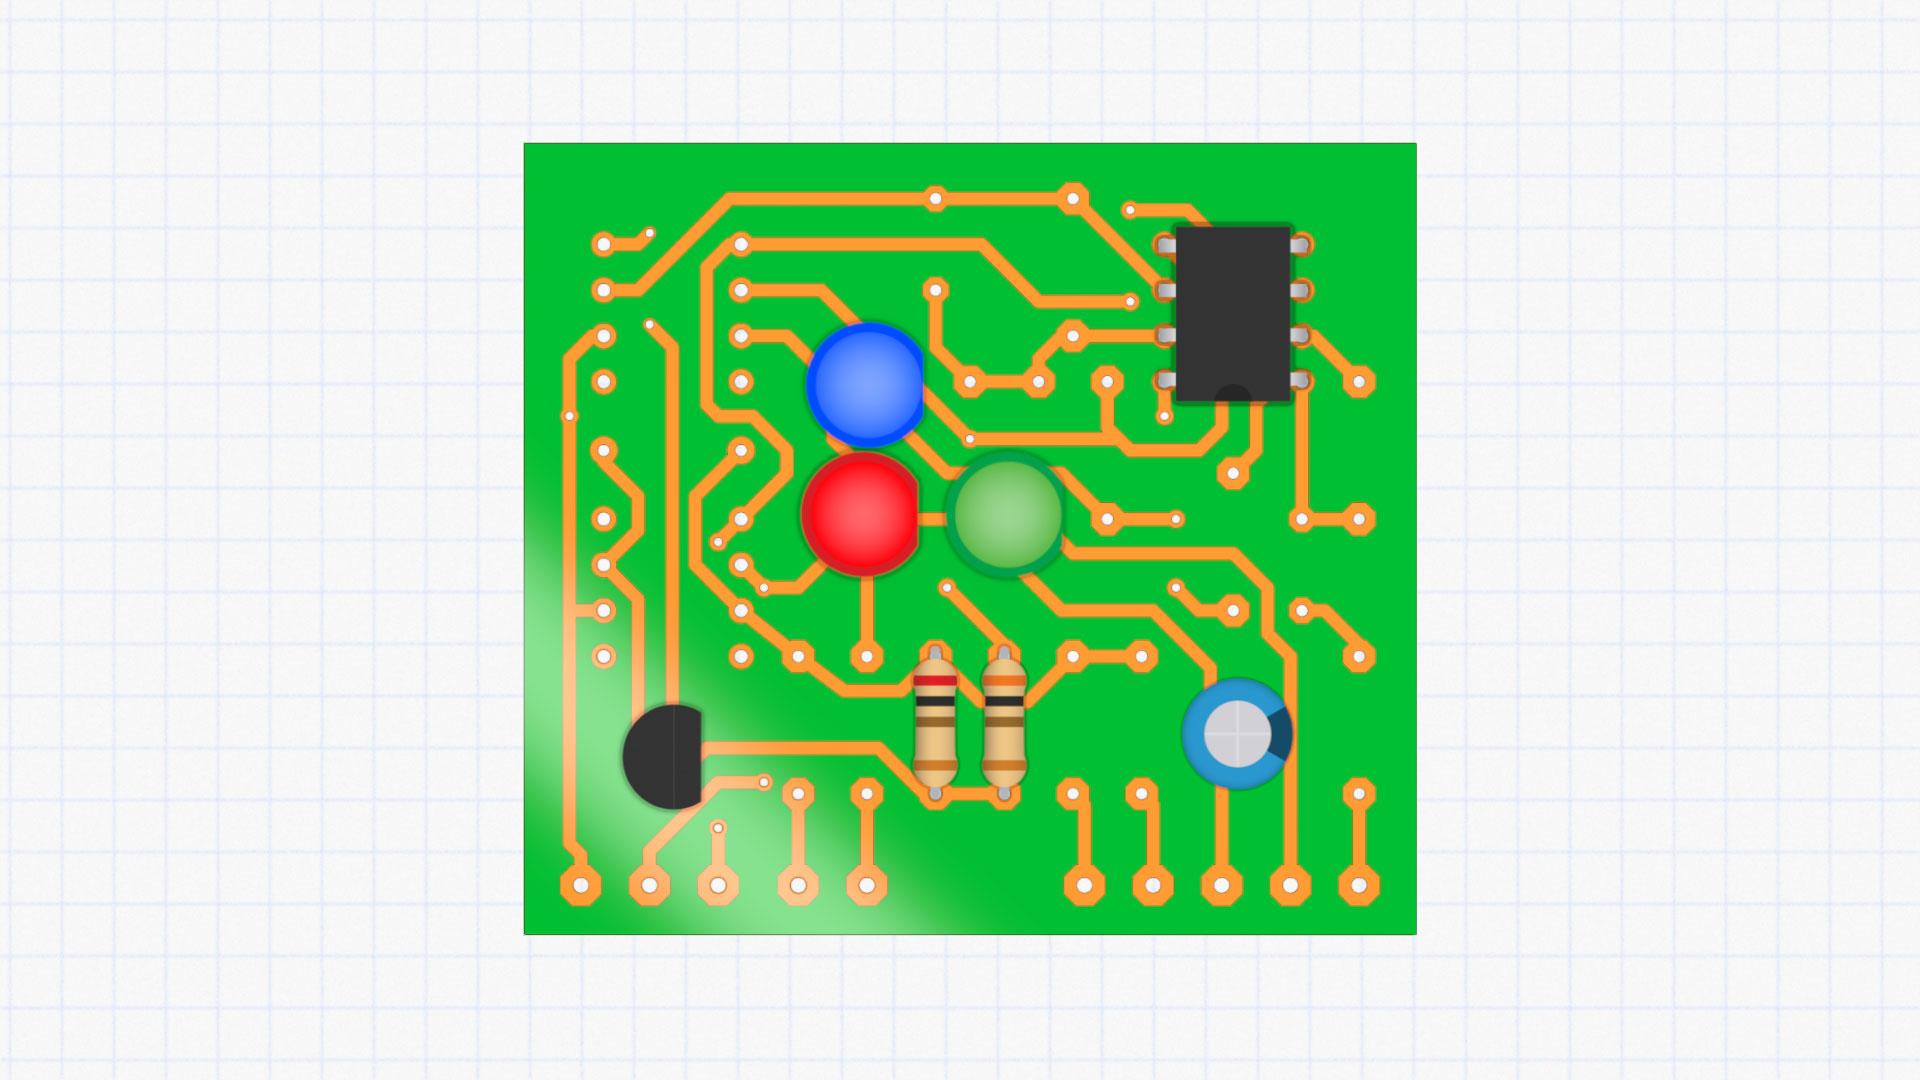 circuit_playground_series_still8.jpg